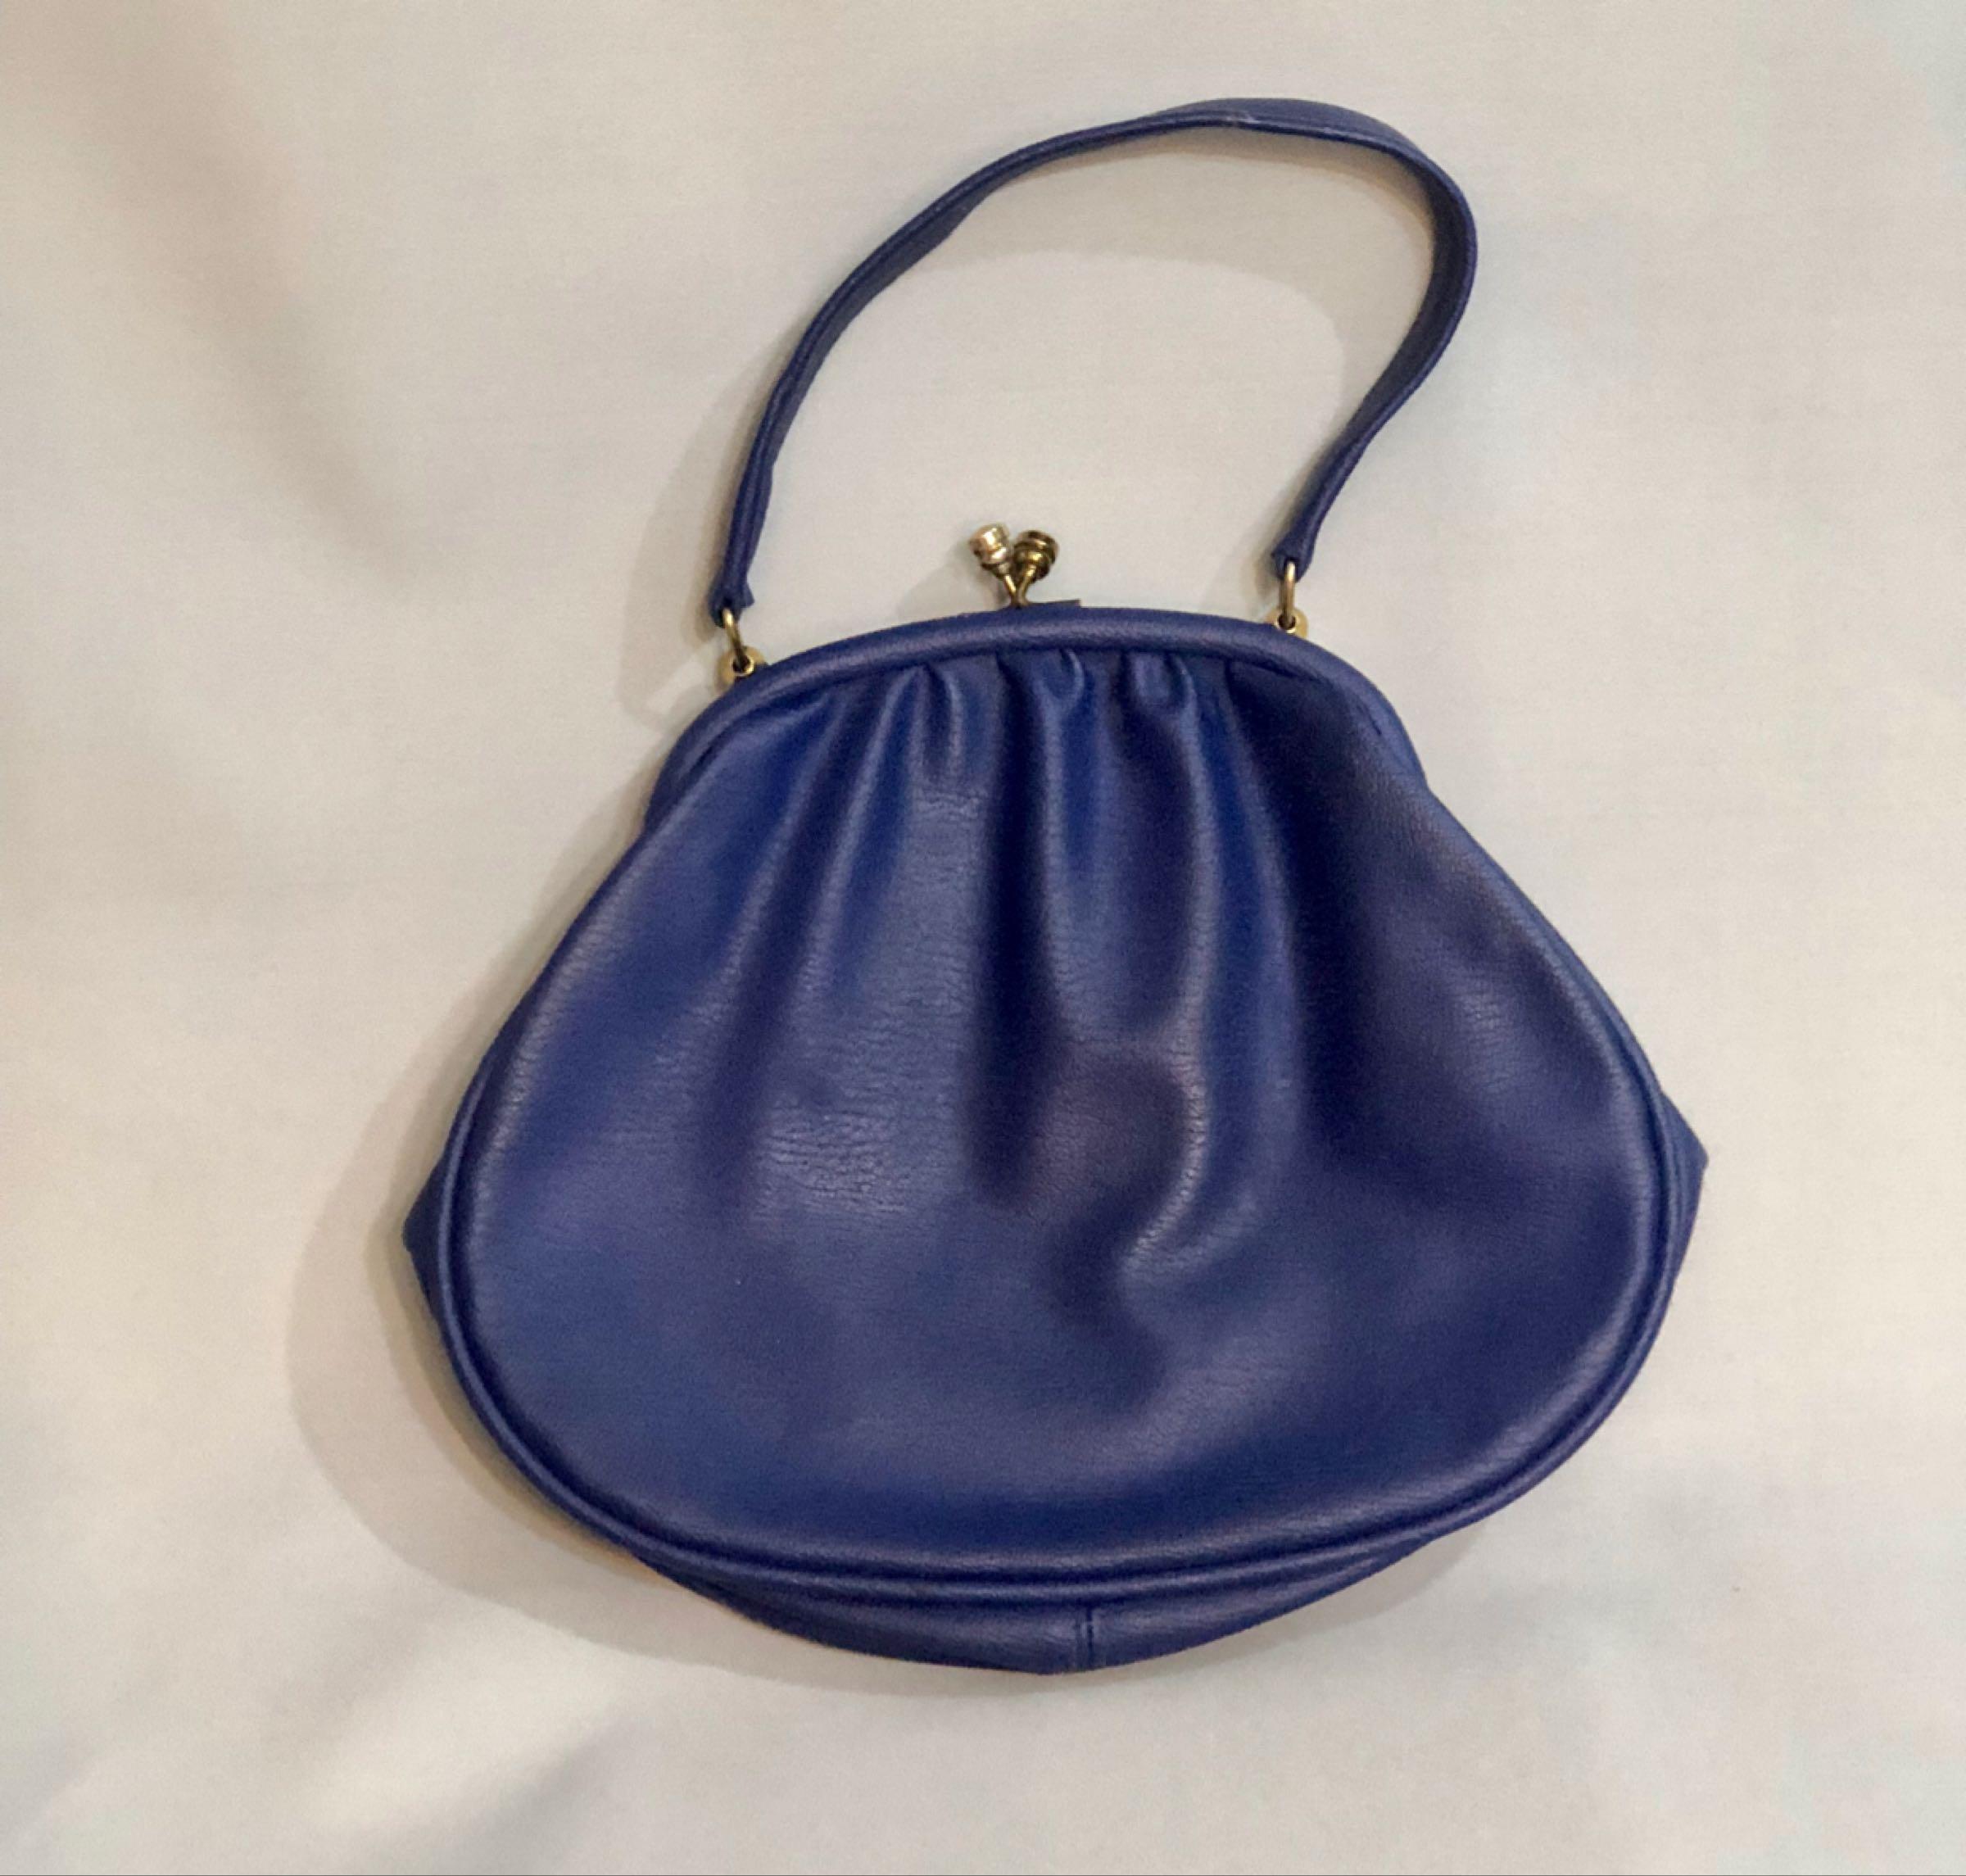 Colbalt handbag